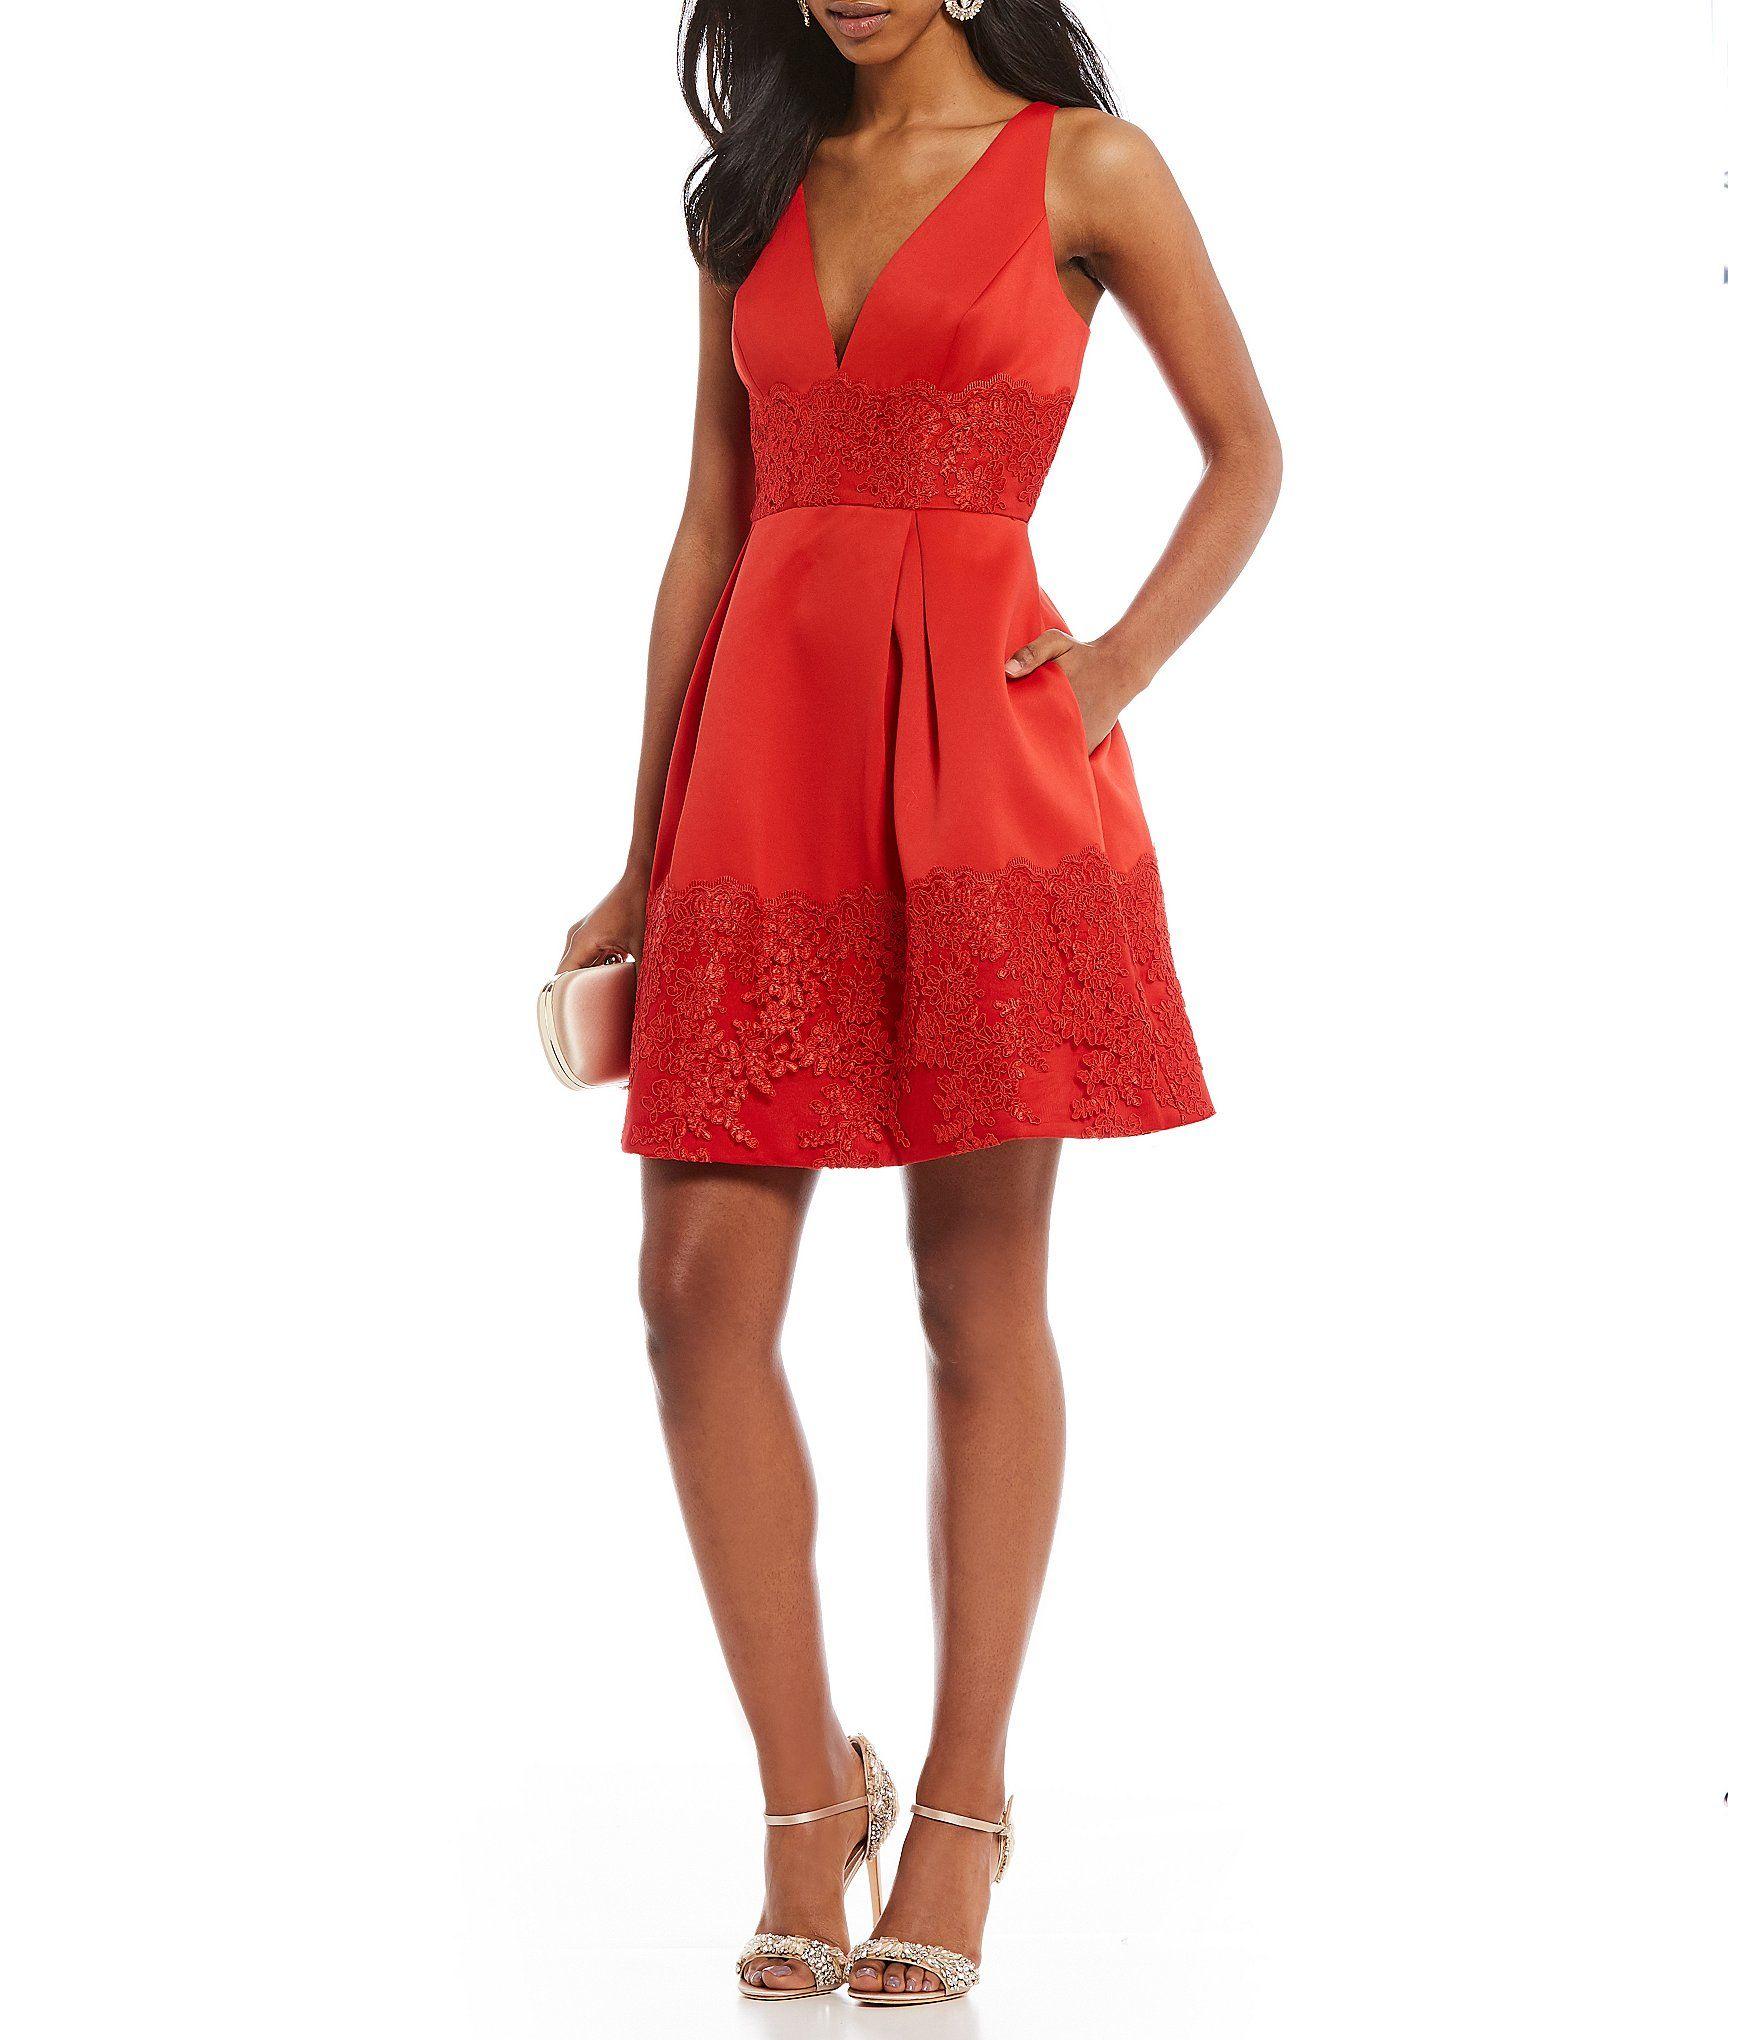 538ea3e109 Dillards New Cocktail Dresses - Gomes Weine AG